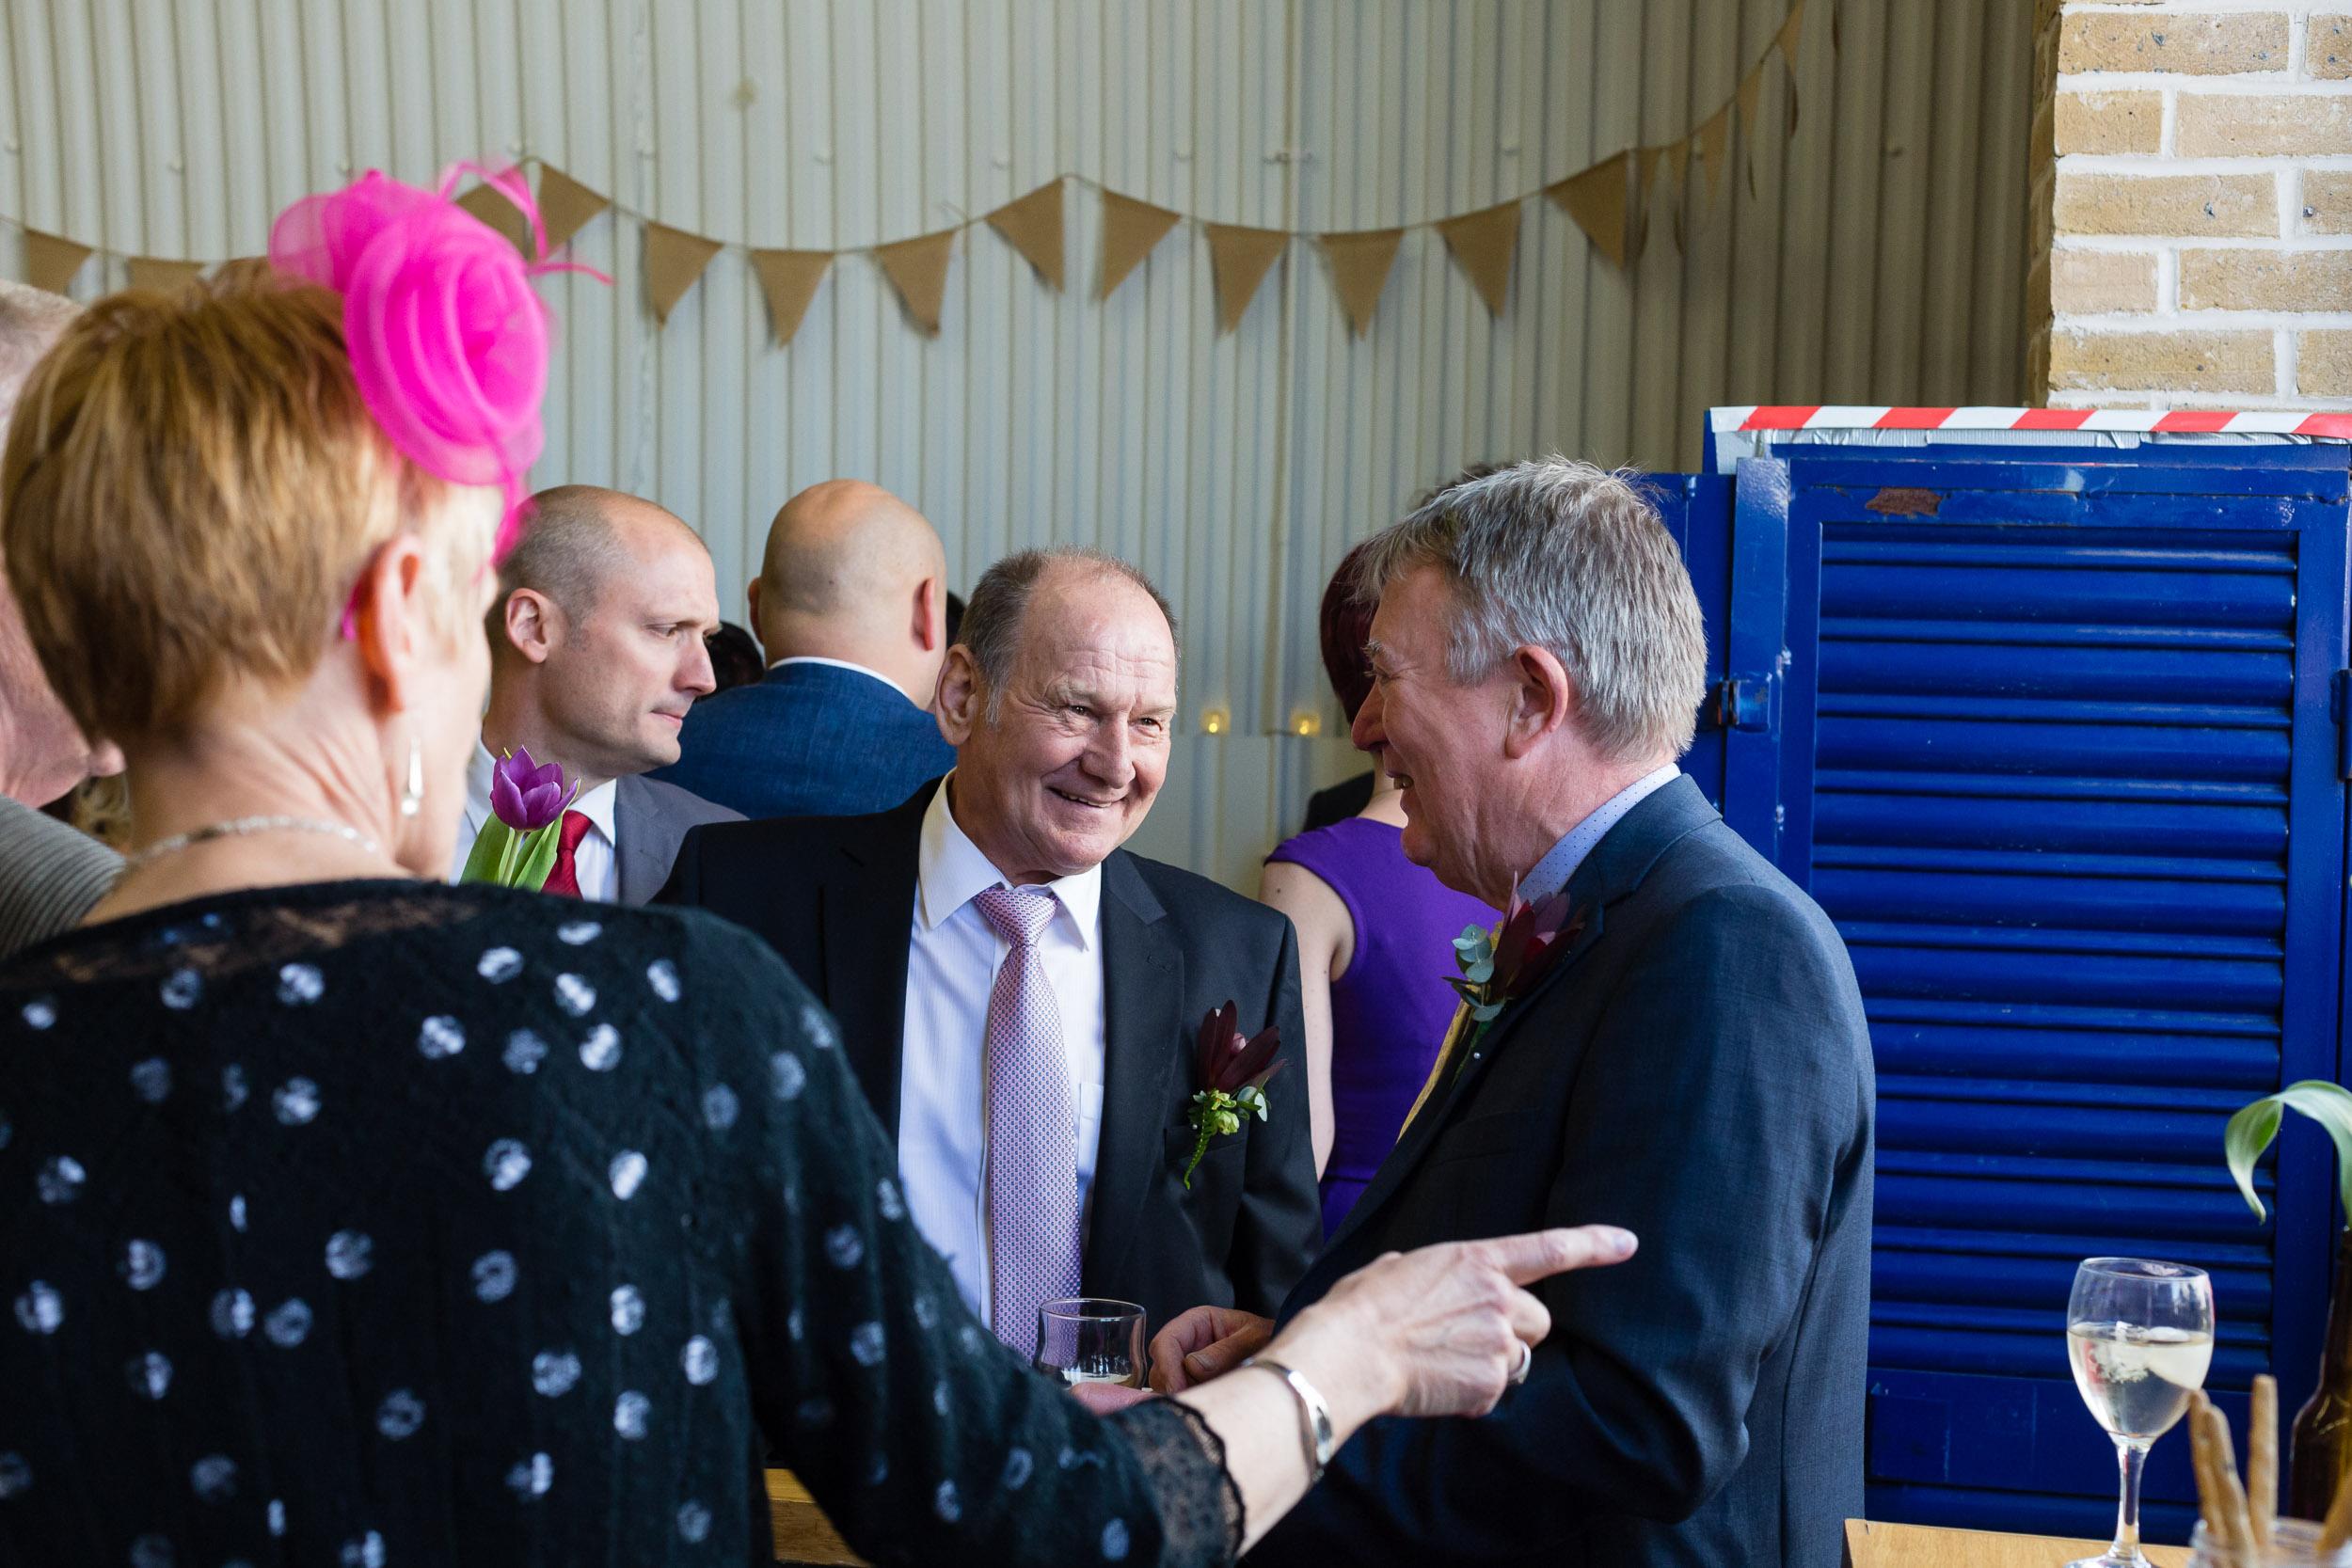 brockwell-lido-brixton-herne-hill-wedding-062.jpg